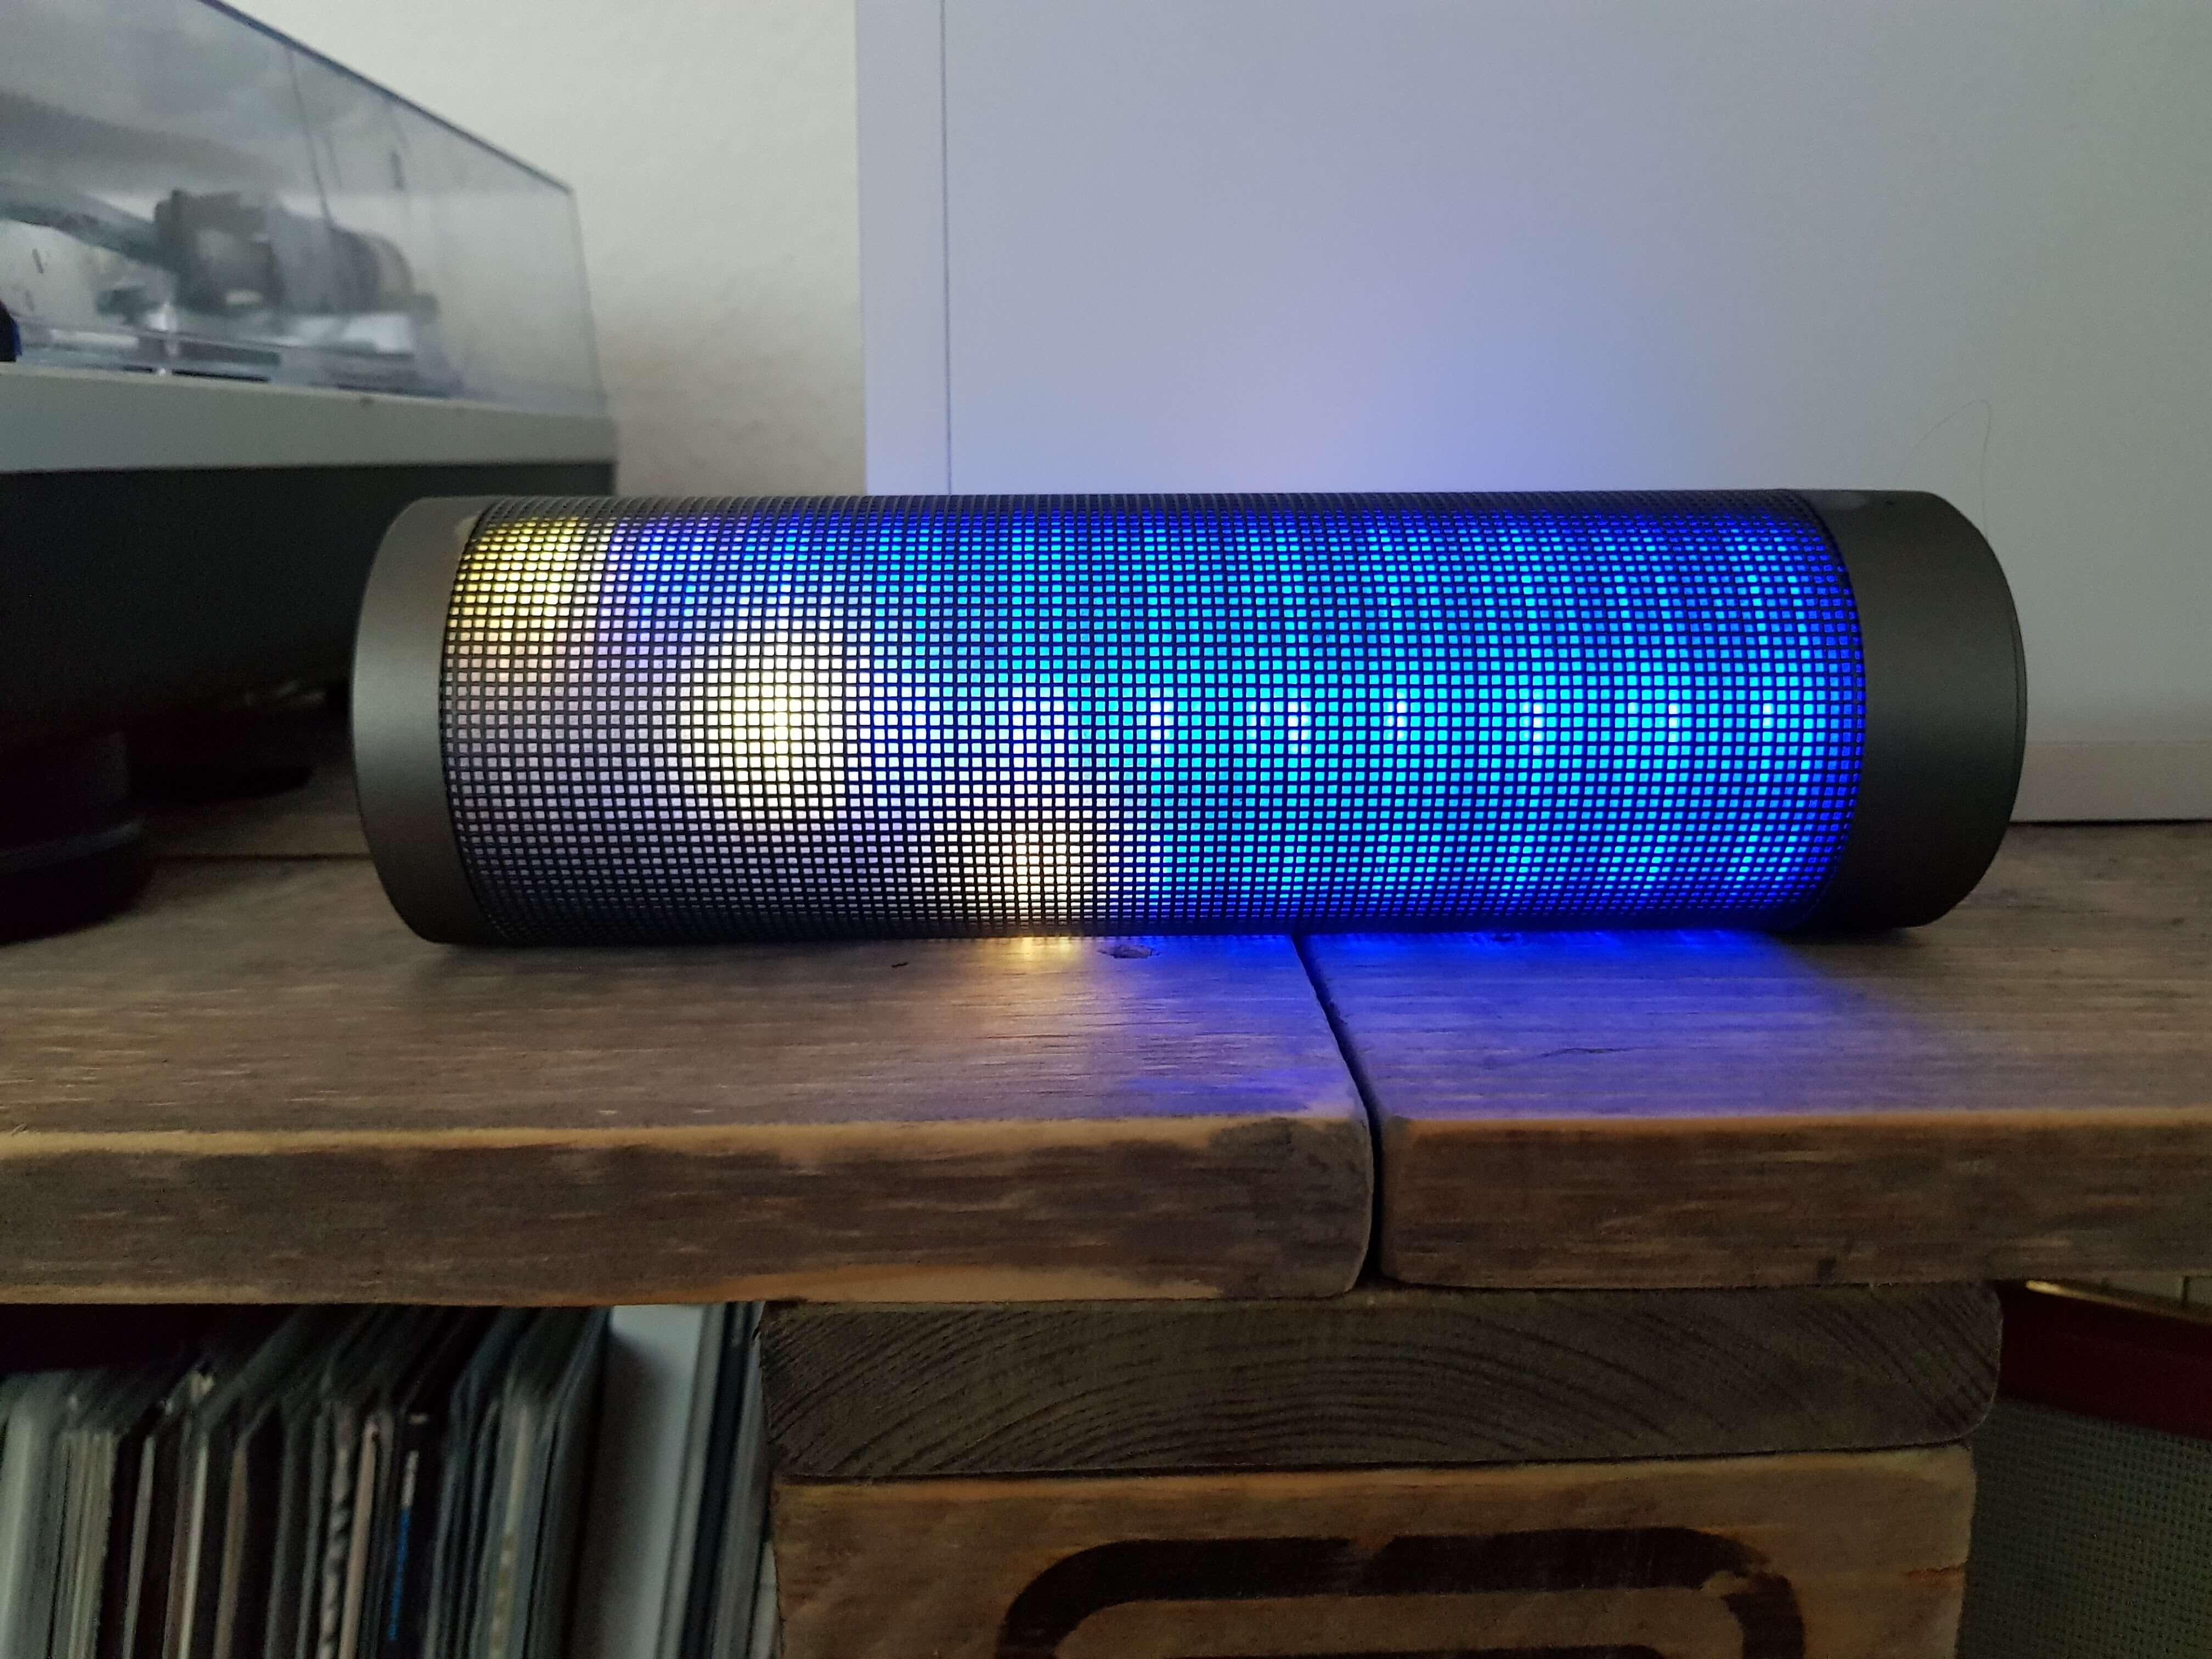 Blinkt viel, klingt gut: Bluetooth Lautsprecher Elegiant HIPHOP im Test 9